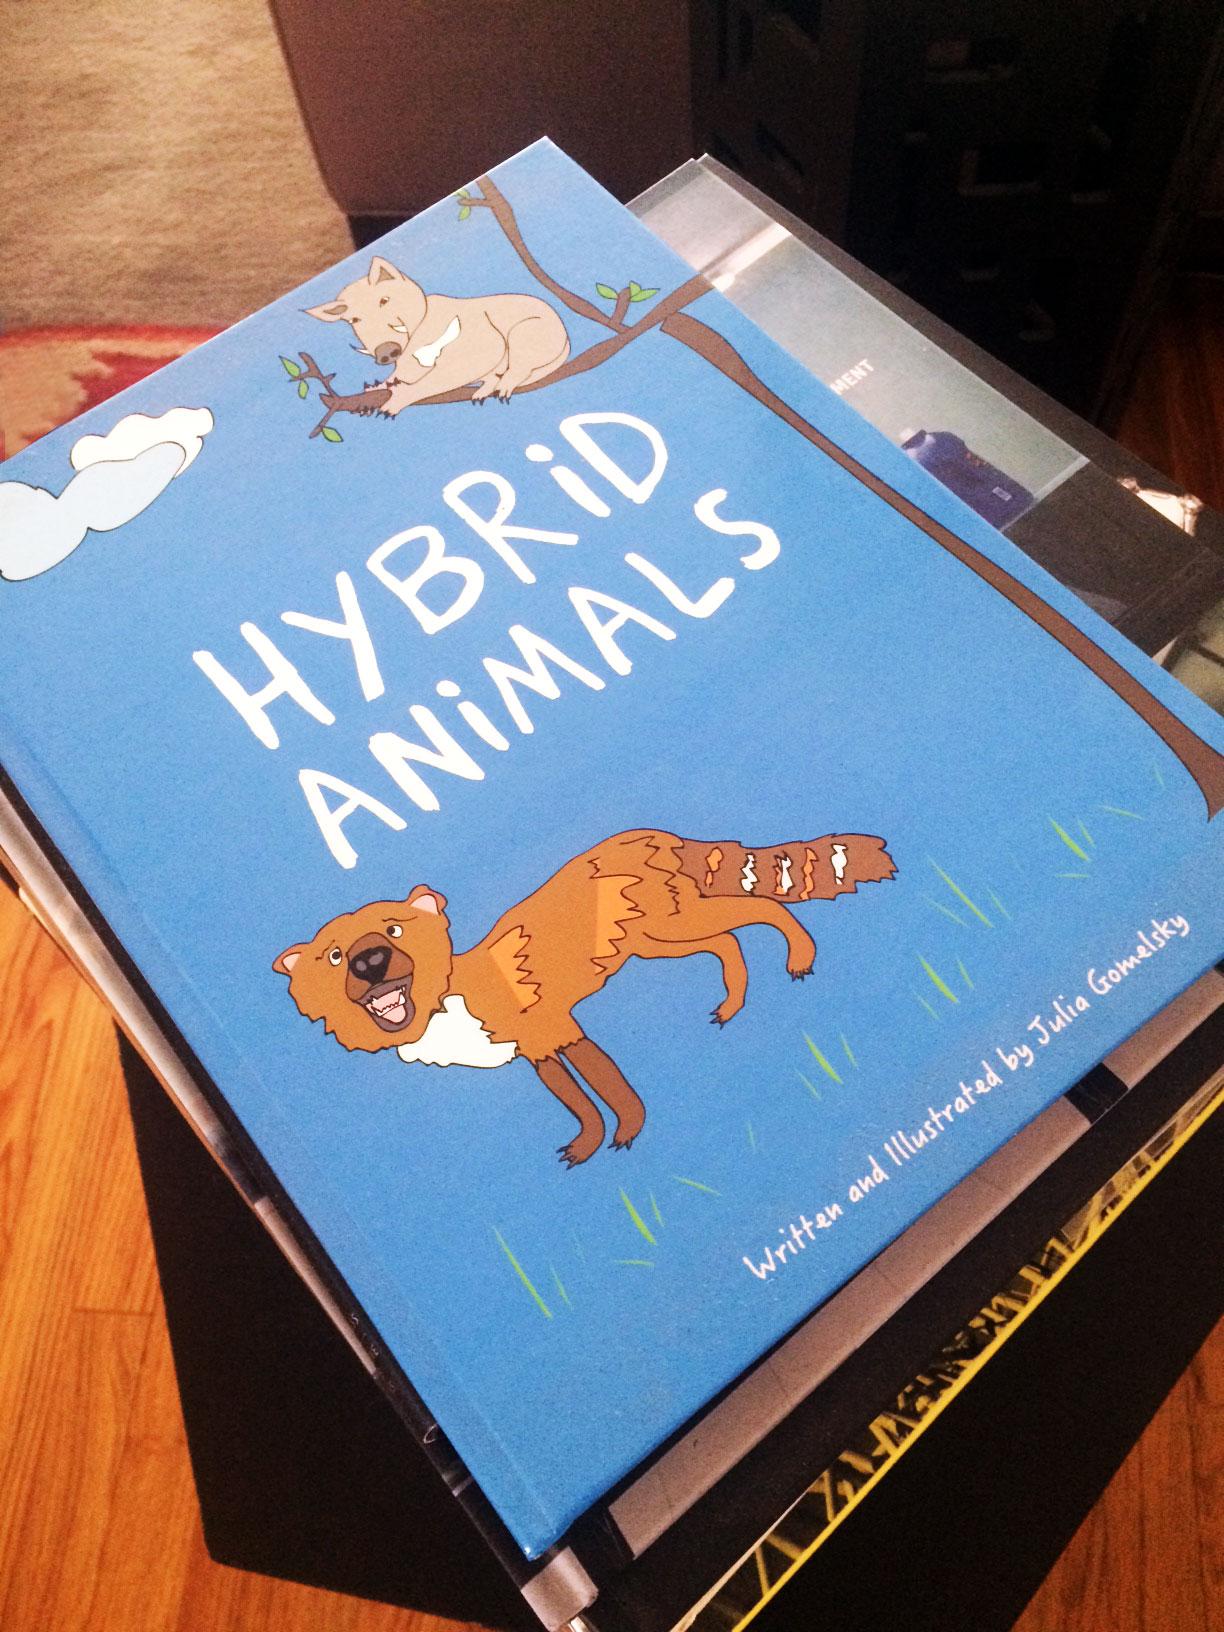 hybrid-animals-custom-illustrated-book-collection-detail.jpg